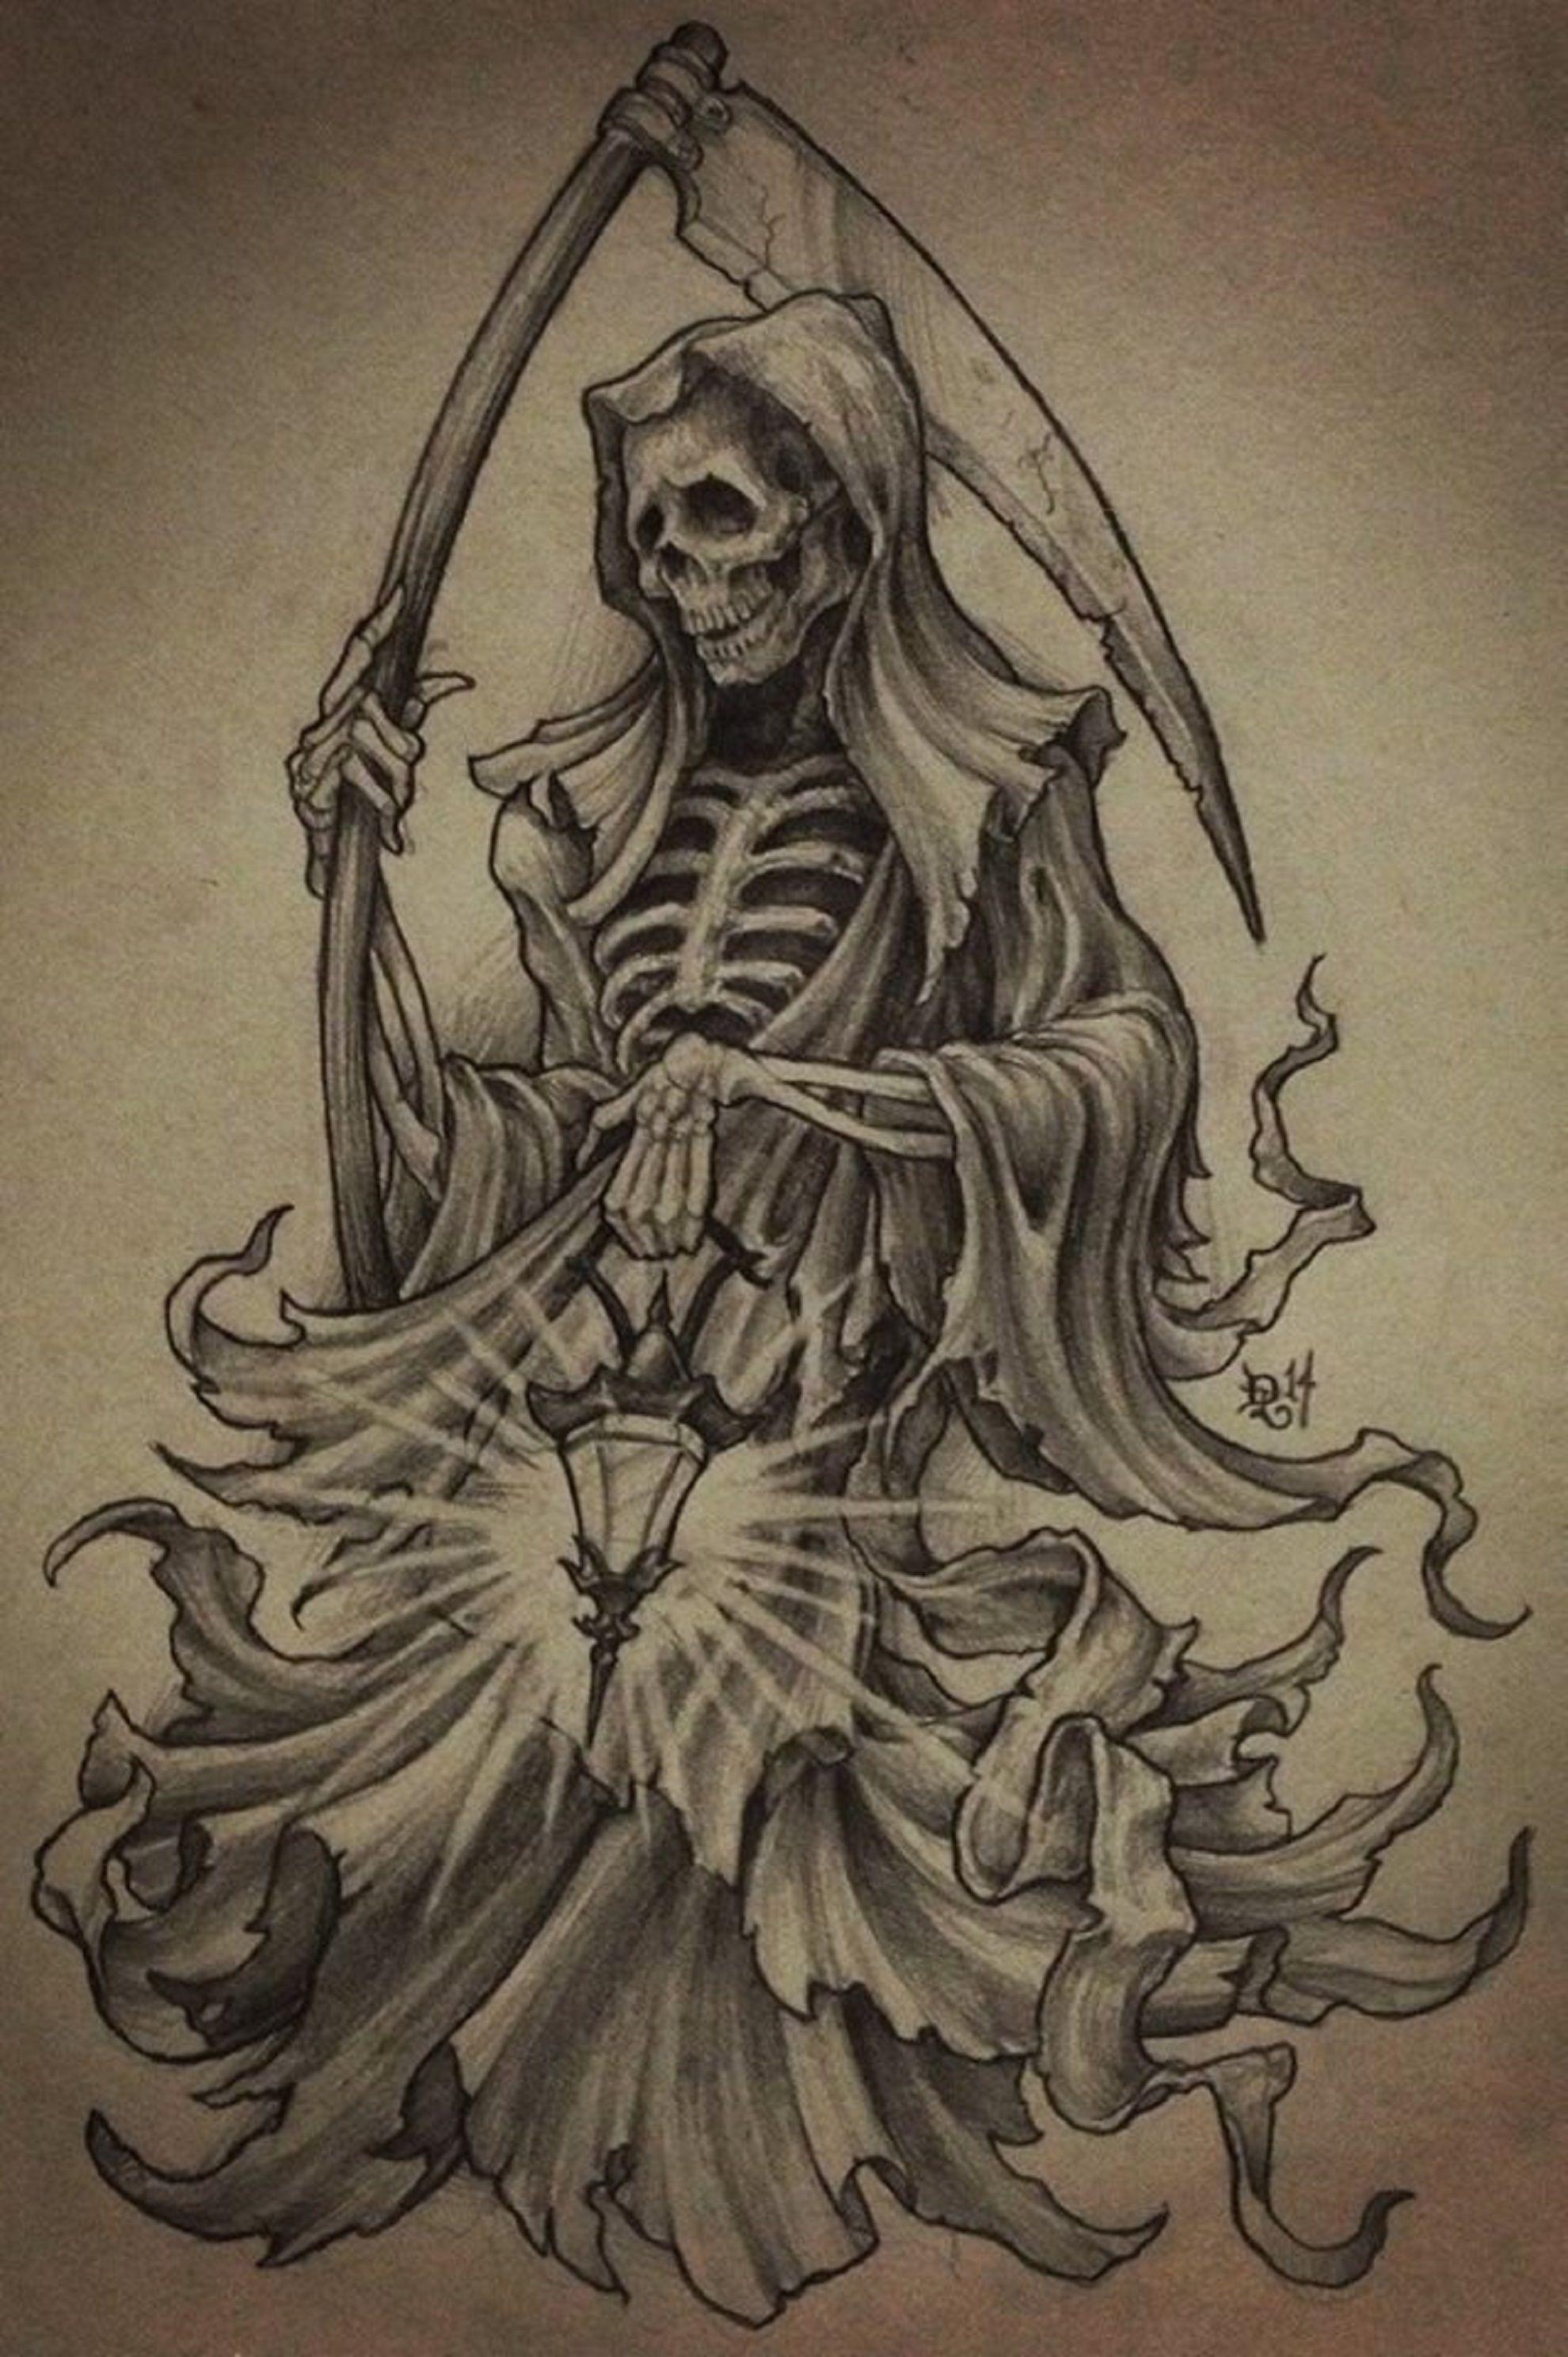 Grim Reaper Reaper Tattoo Grim Reaper Tattoo Grim Reaper Art